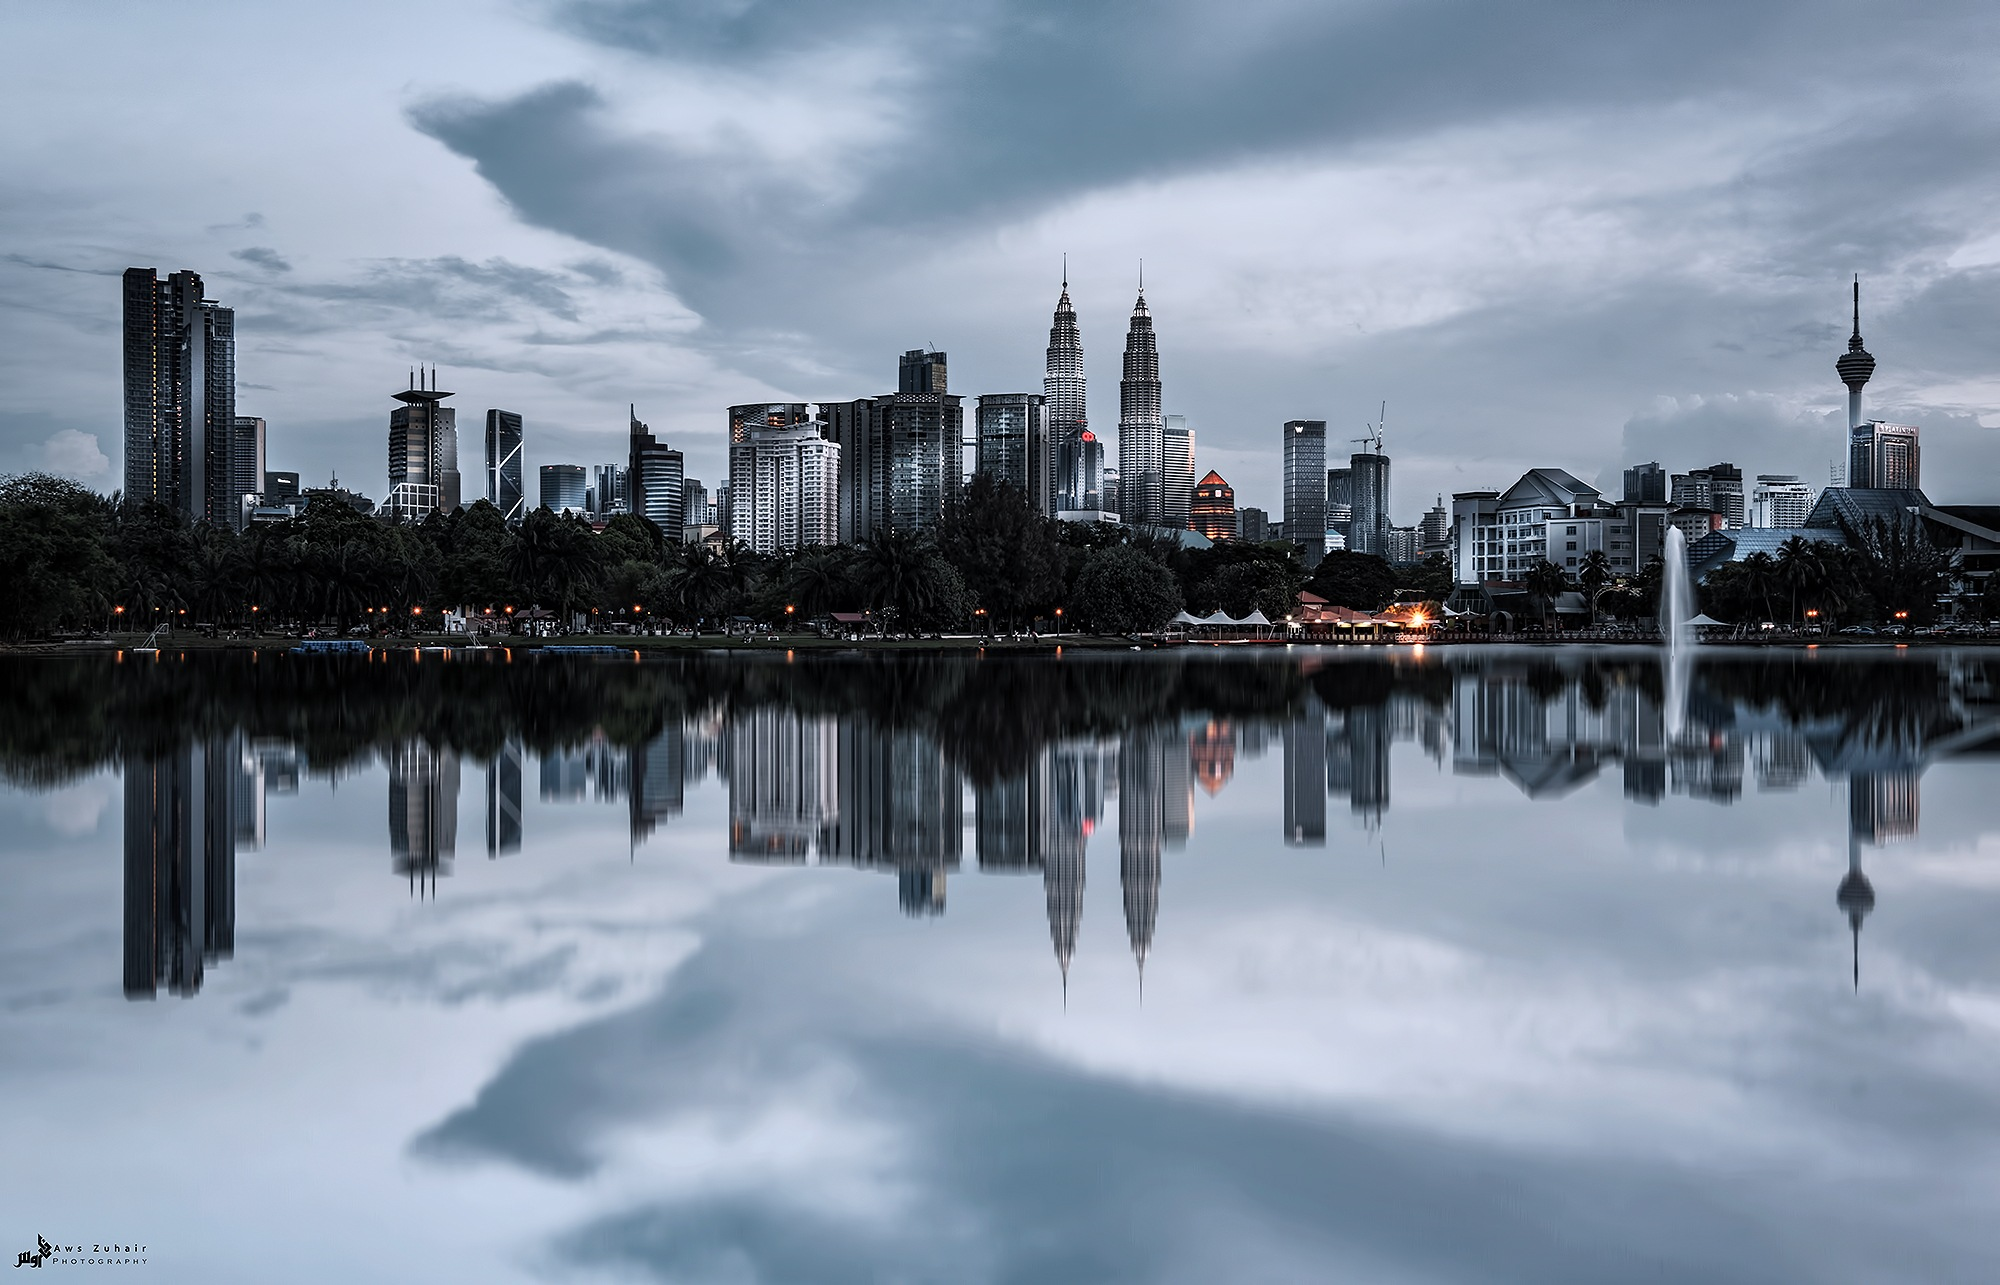 Kuala Lumpur in Gotham style  by AwsZuhair